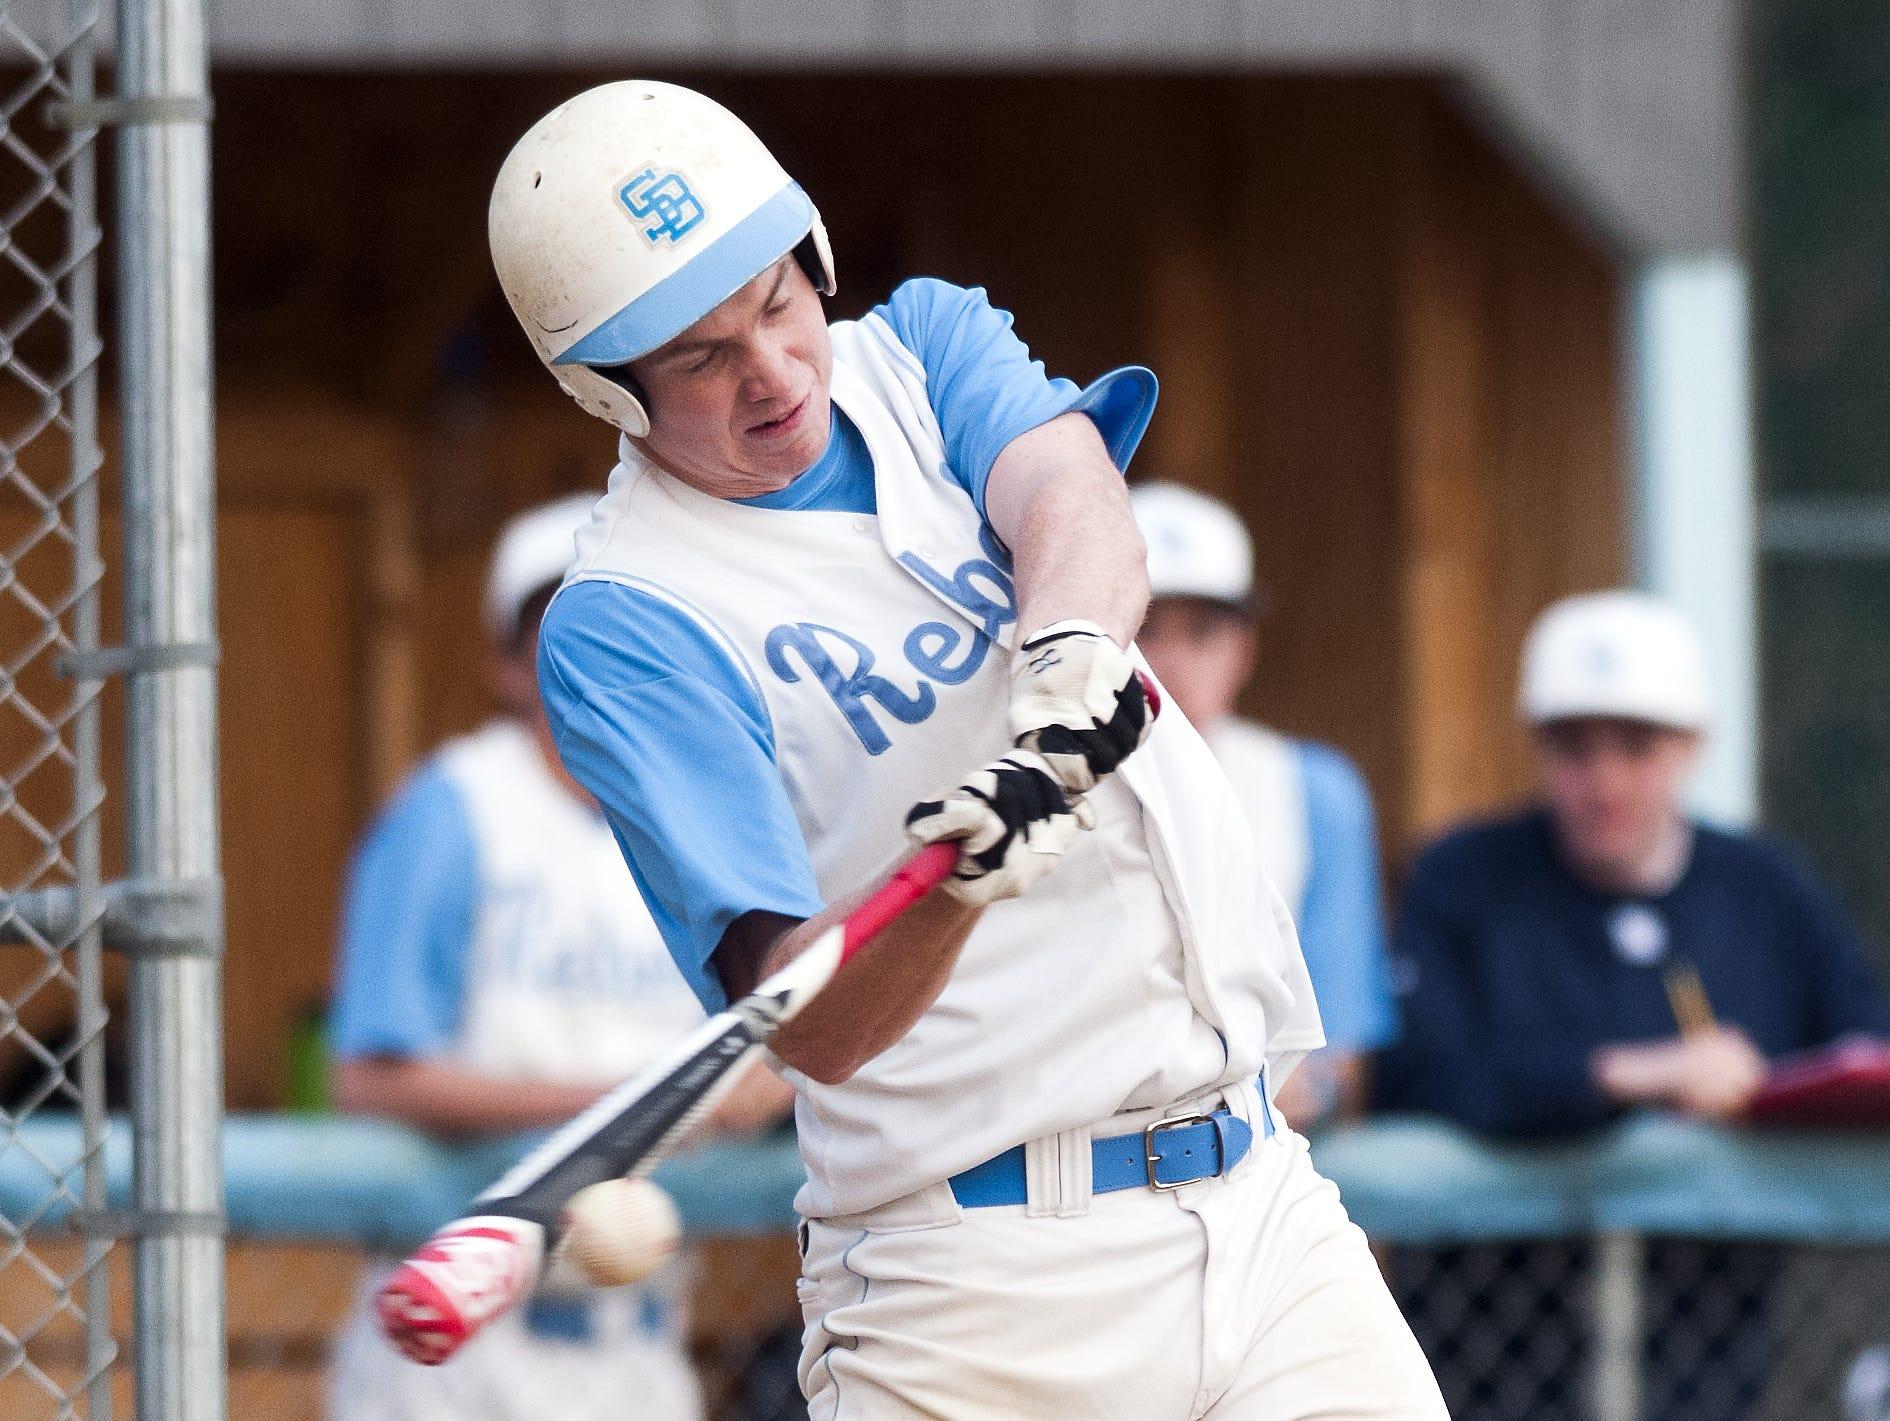 South Burlington's Connor Bradley (10) hits the ball during Thursday's baseball game against Champlain Valley.